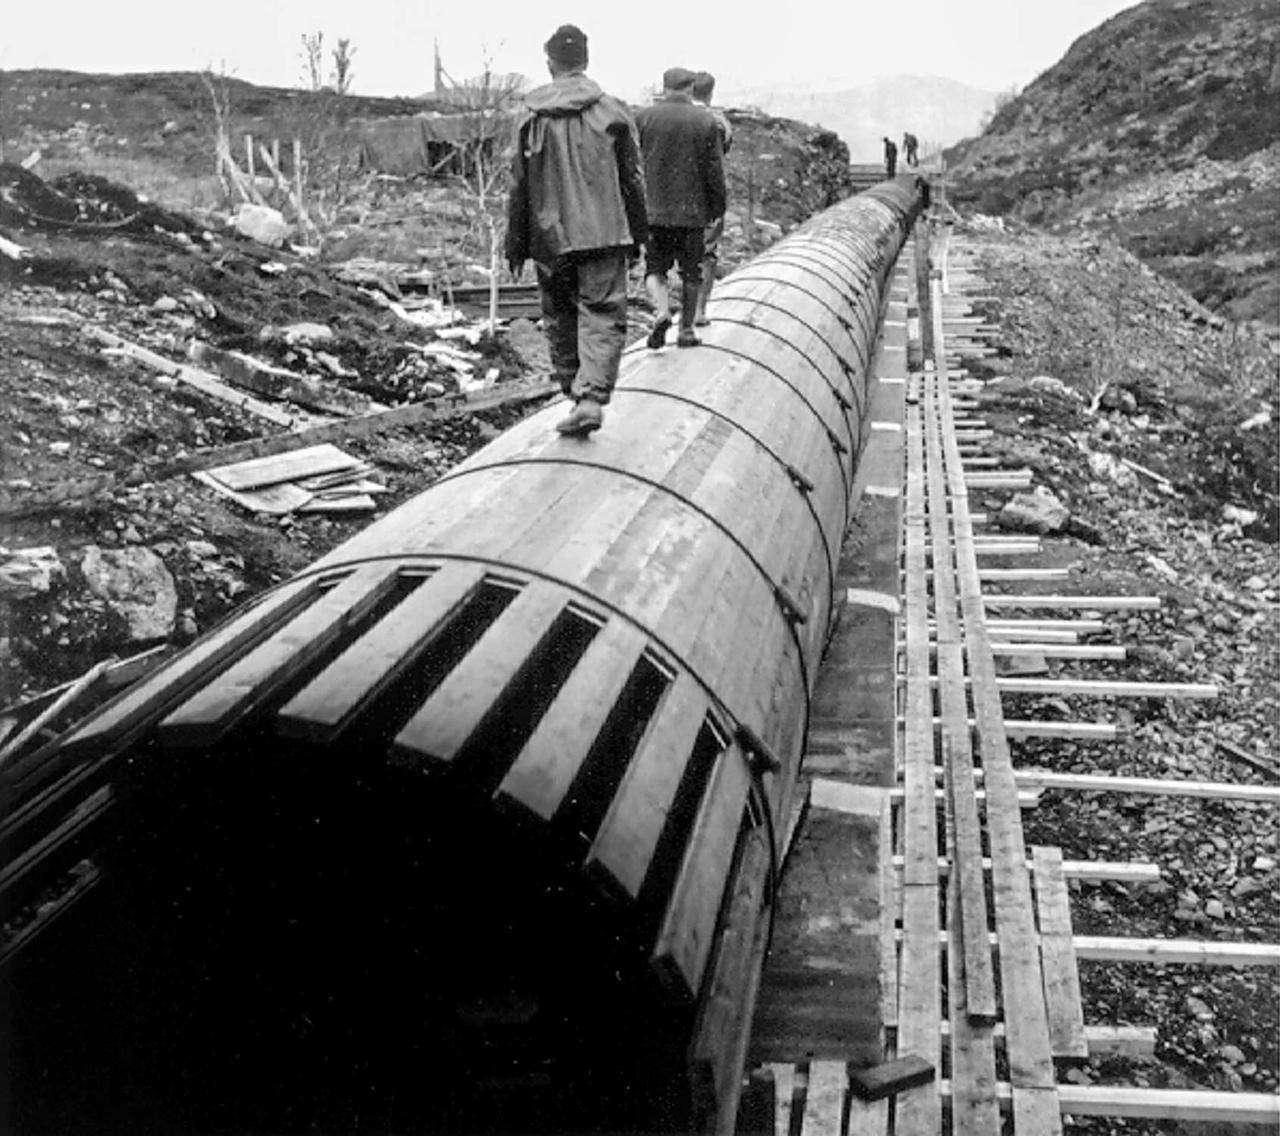 Pipeline transport, Black, Sky, Style, Wood